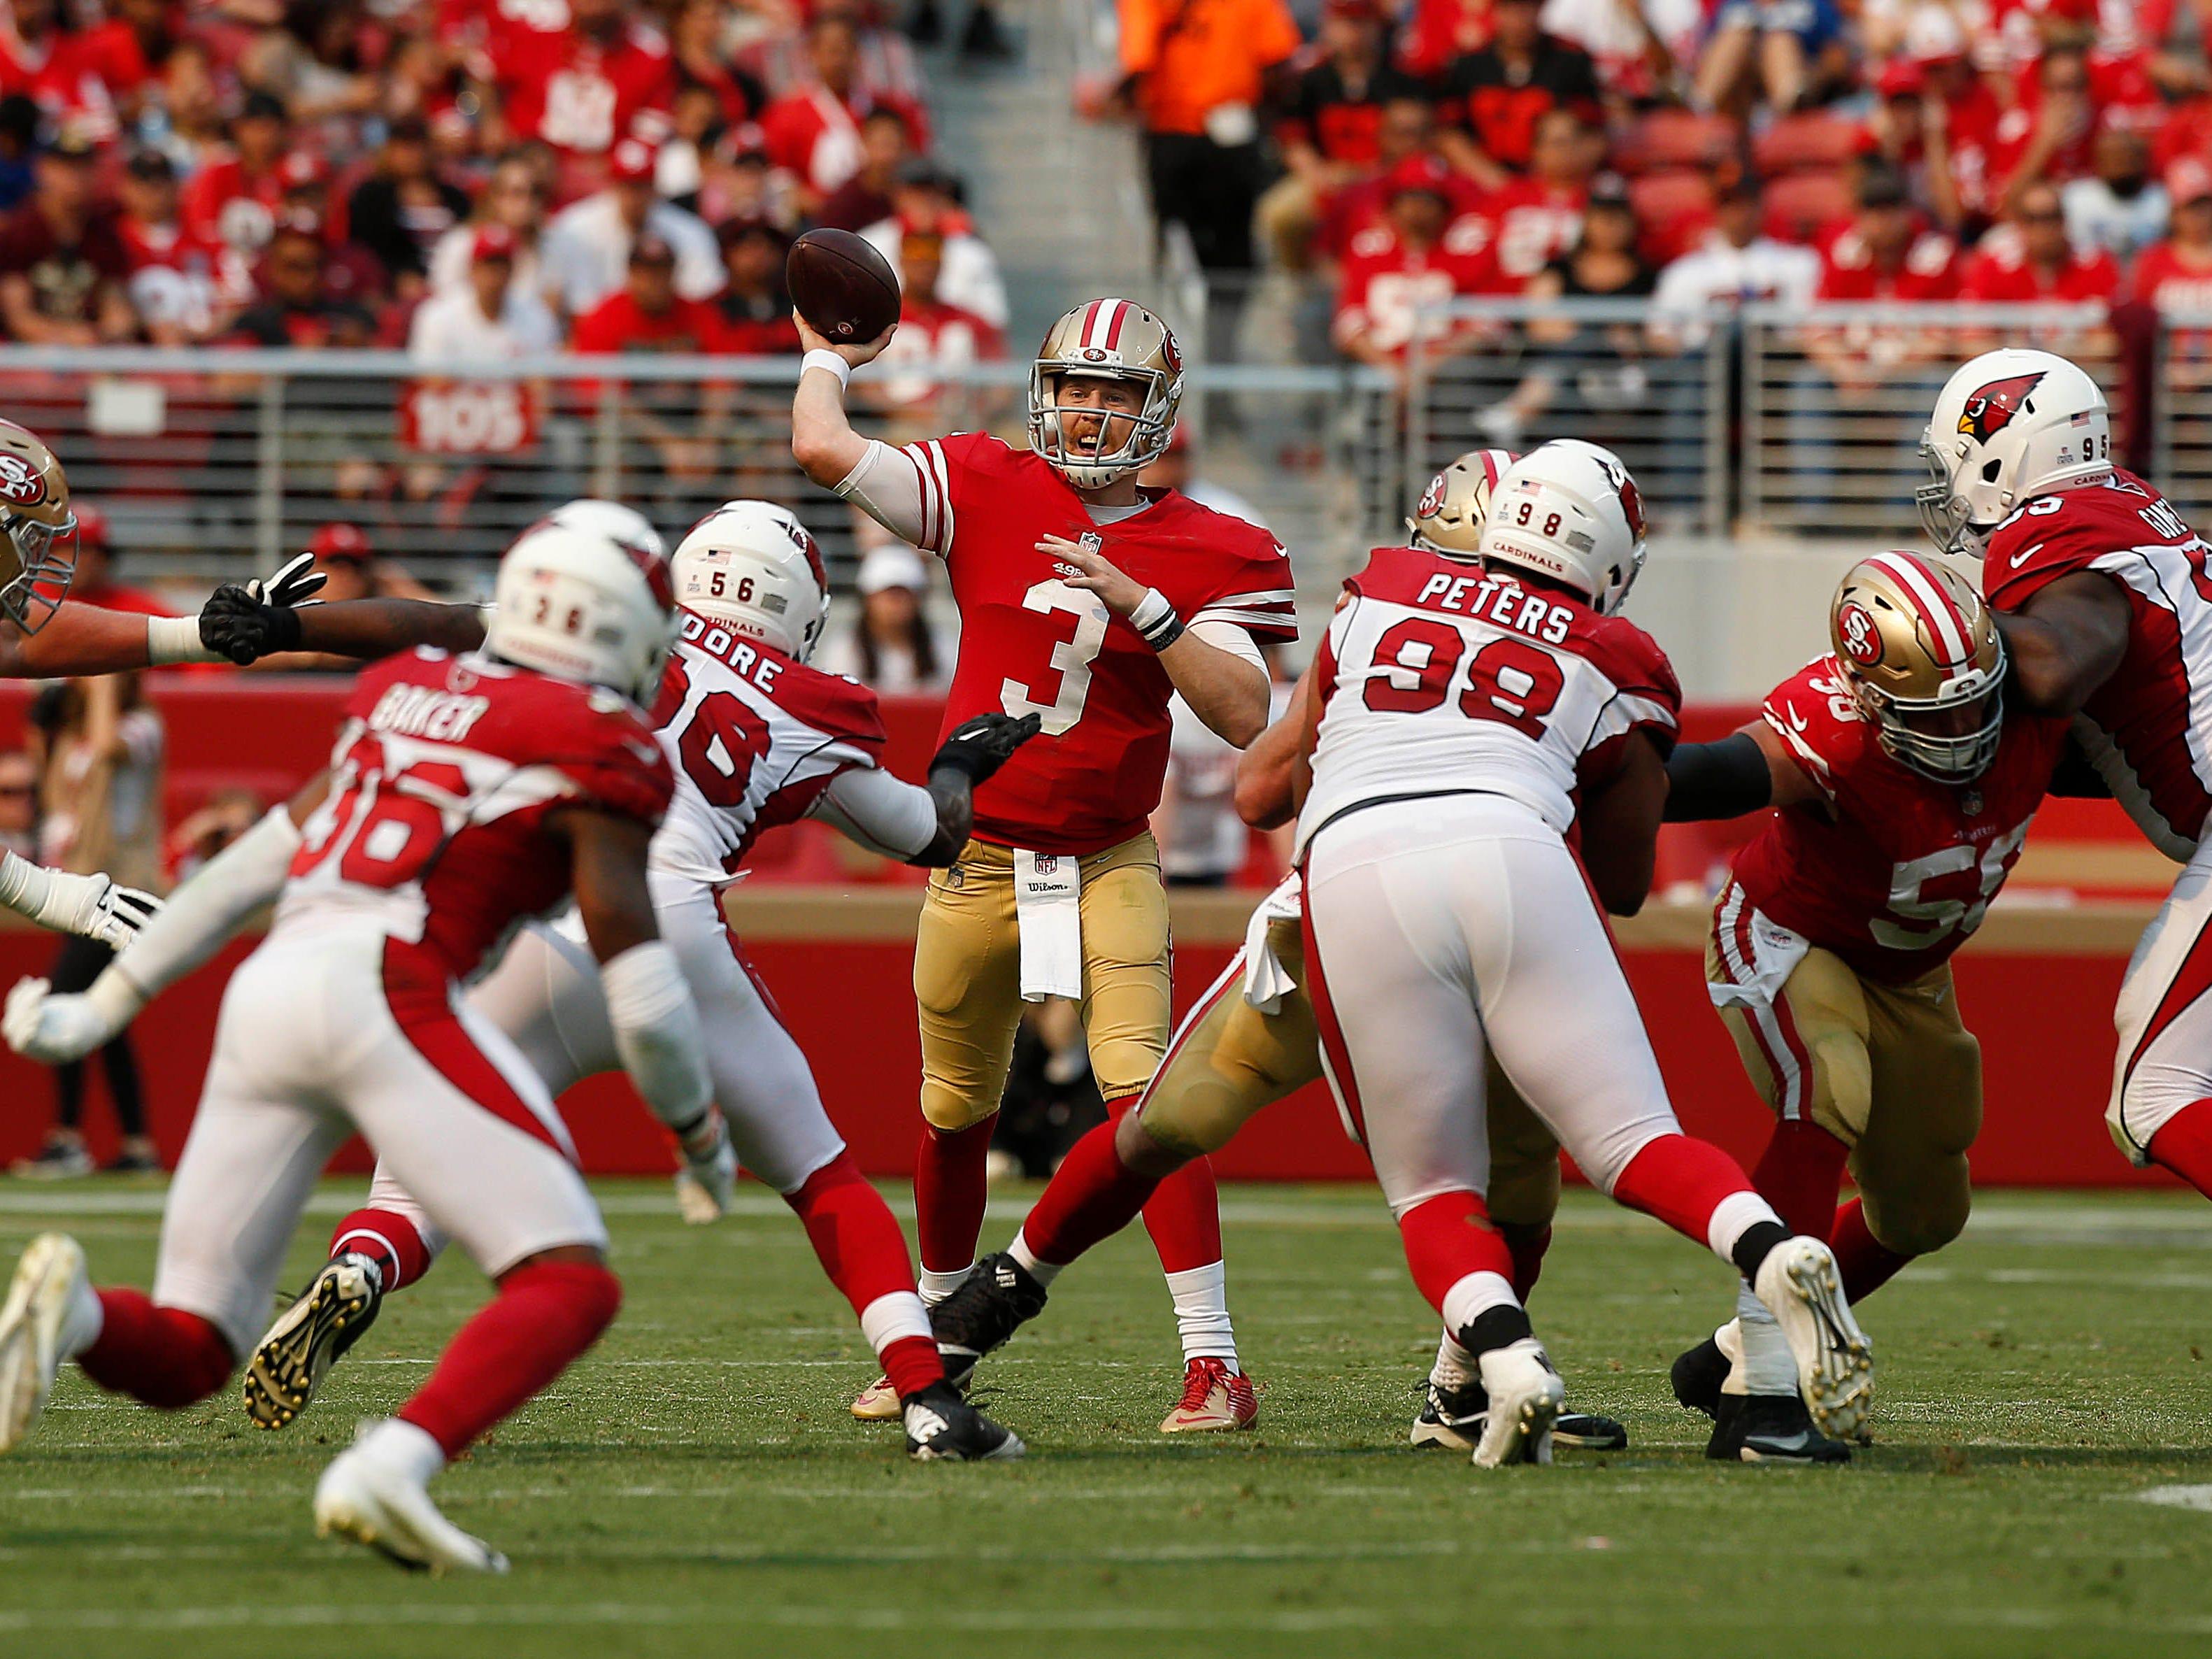 Oct 7, 2018; Santa Clara, CA, USA; San Francisco 49ers quarterback C.J. Beathard (3) throws a pass against the Arizona Cardinals in the second quarter at Levi's Stadium.